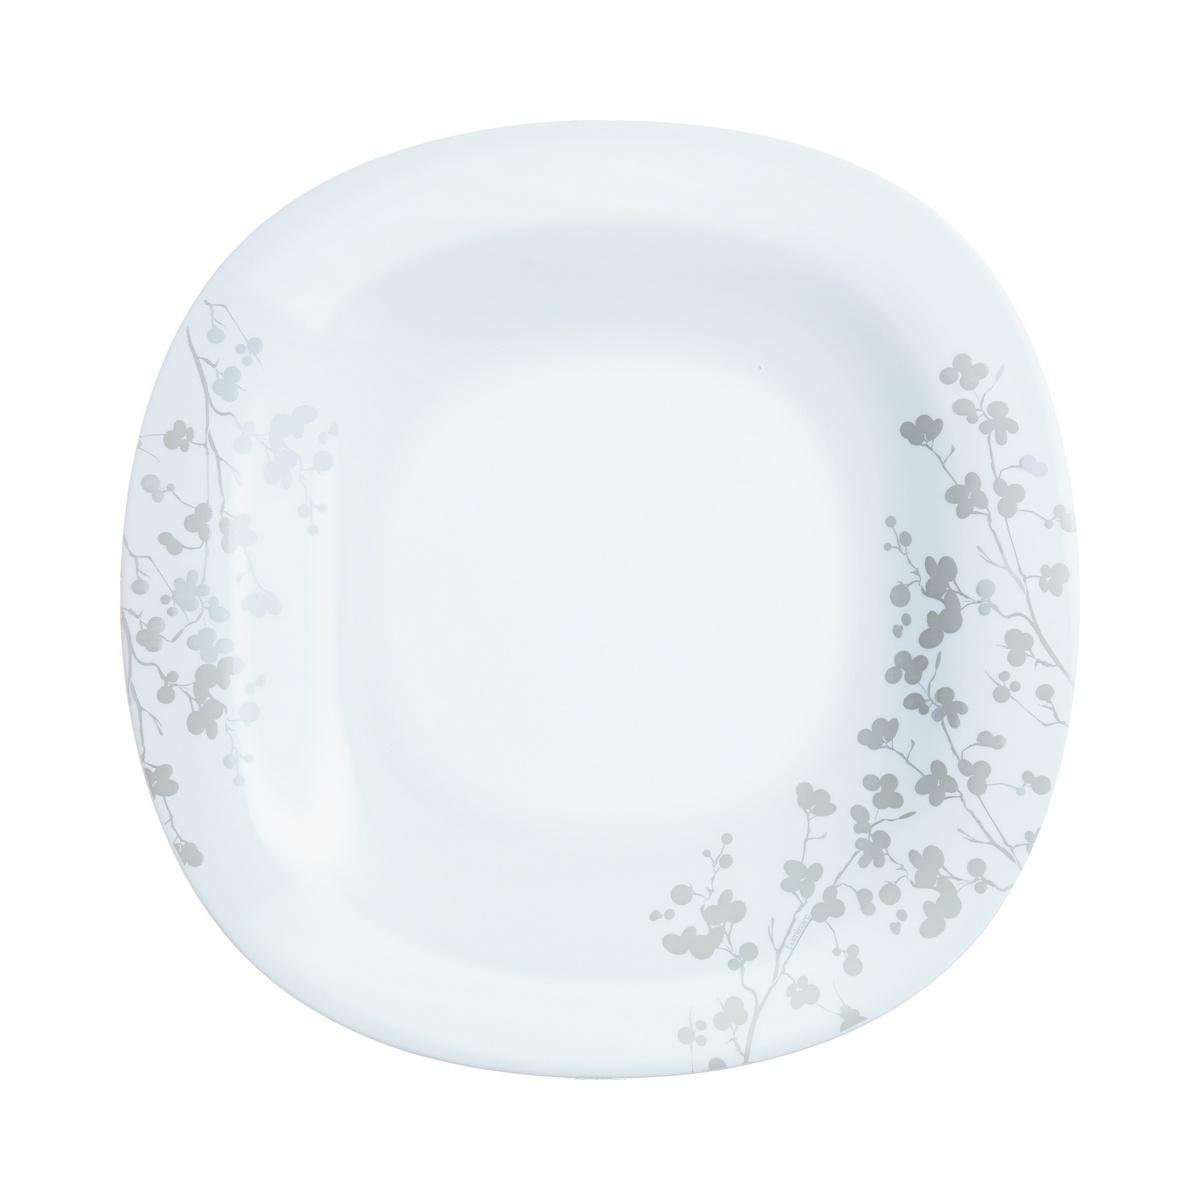 Luminarc Sada mělkých talířů Ombrelle 27 cm, 6 ks, bílá